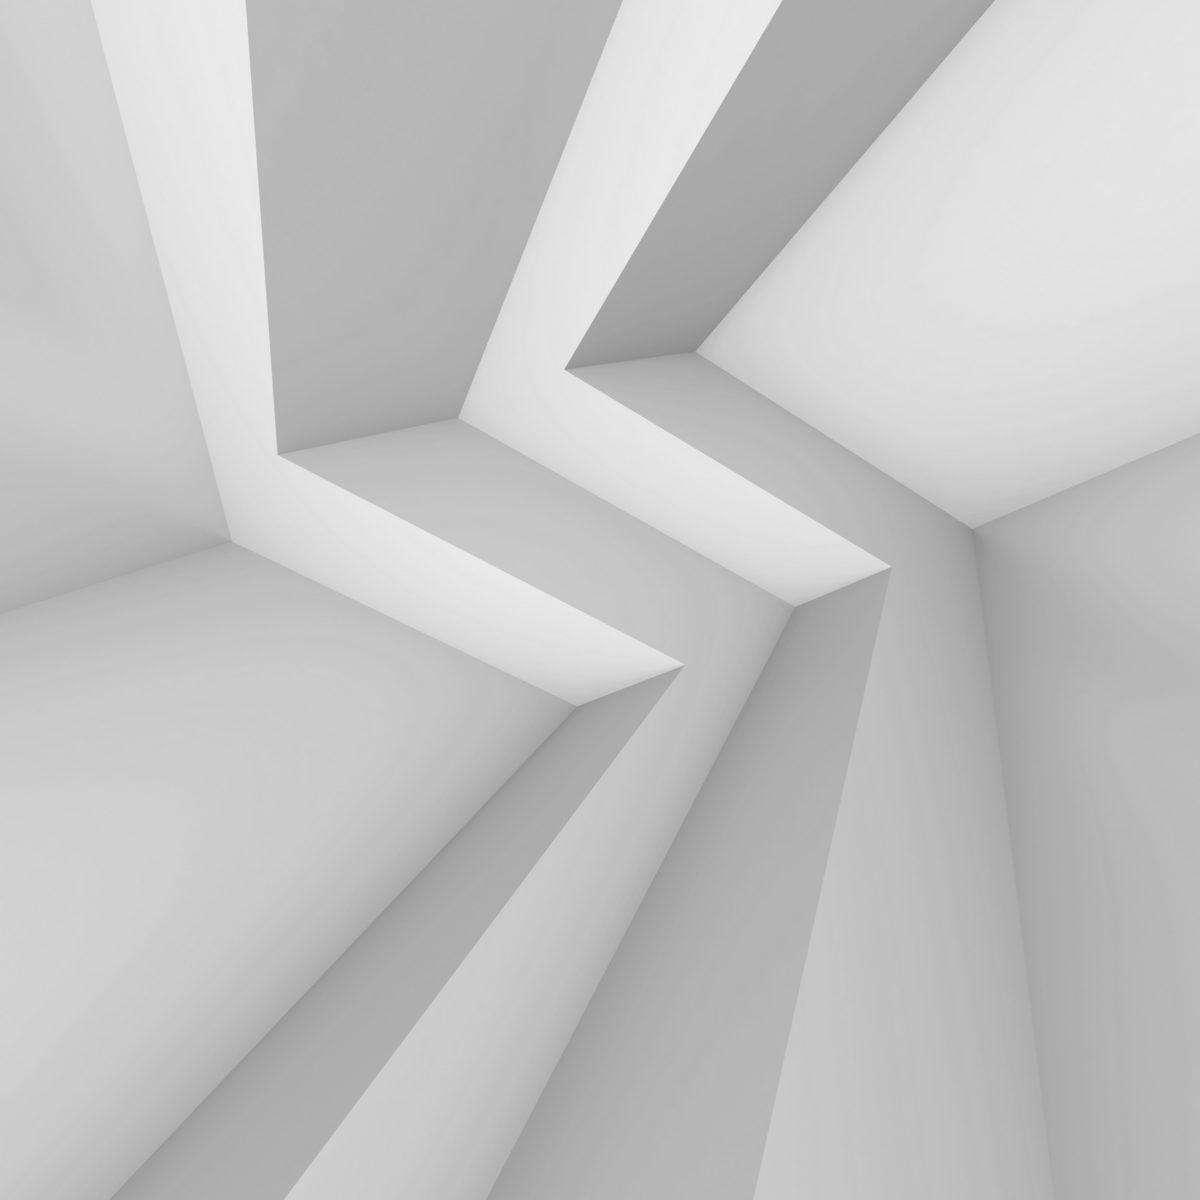 shutterstock_118115023-1200x1200.jpg